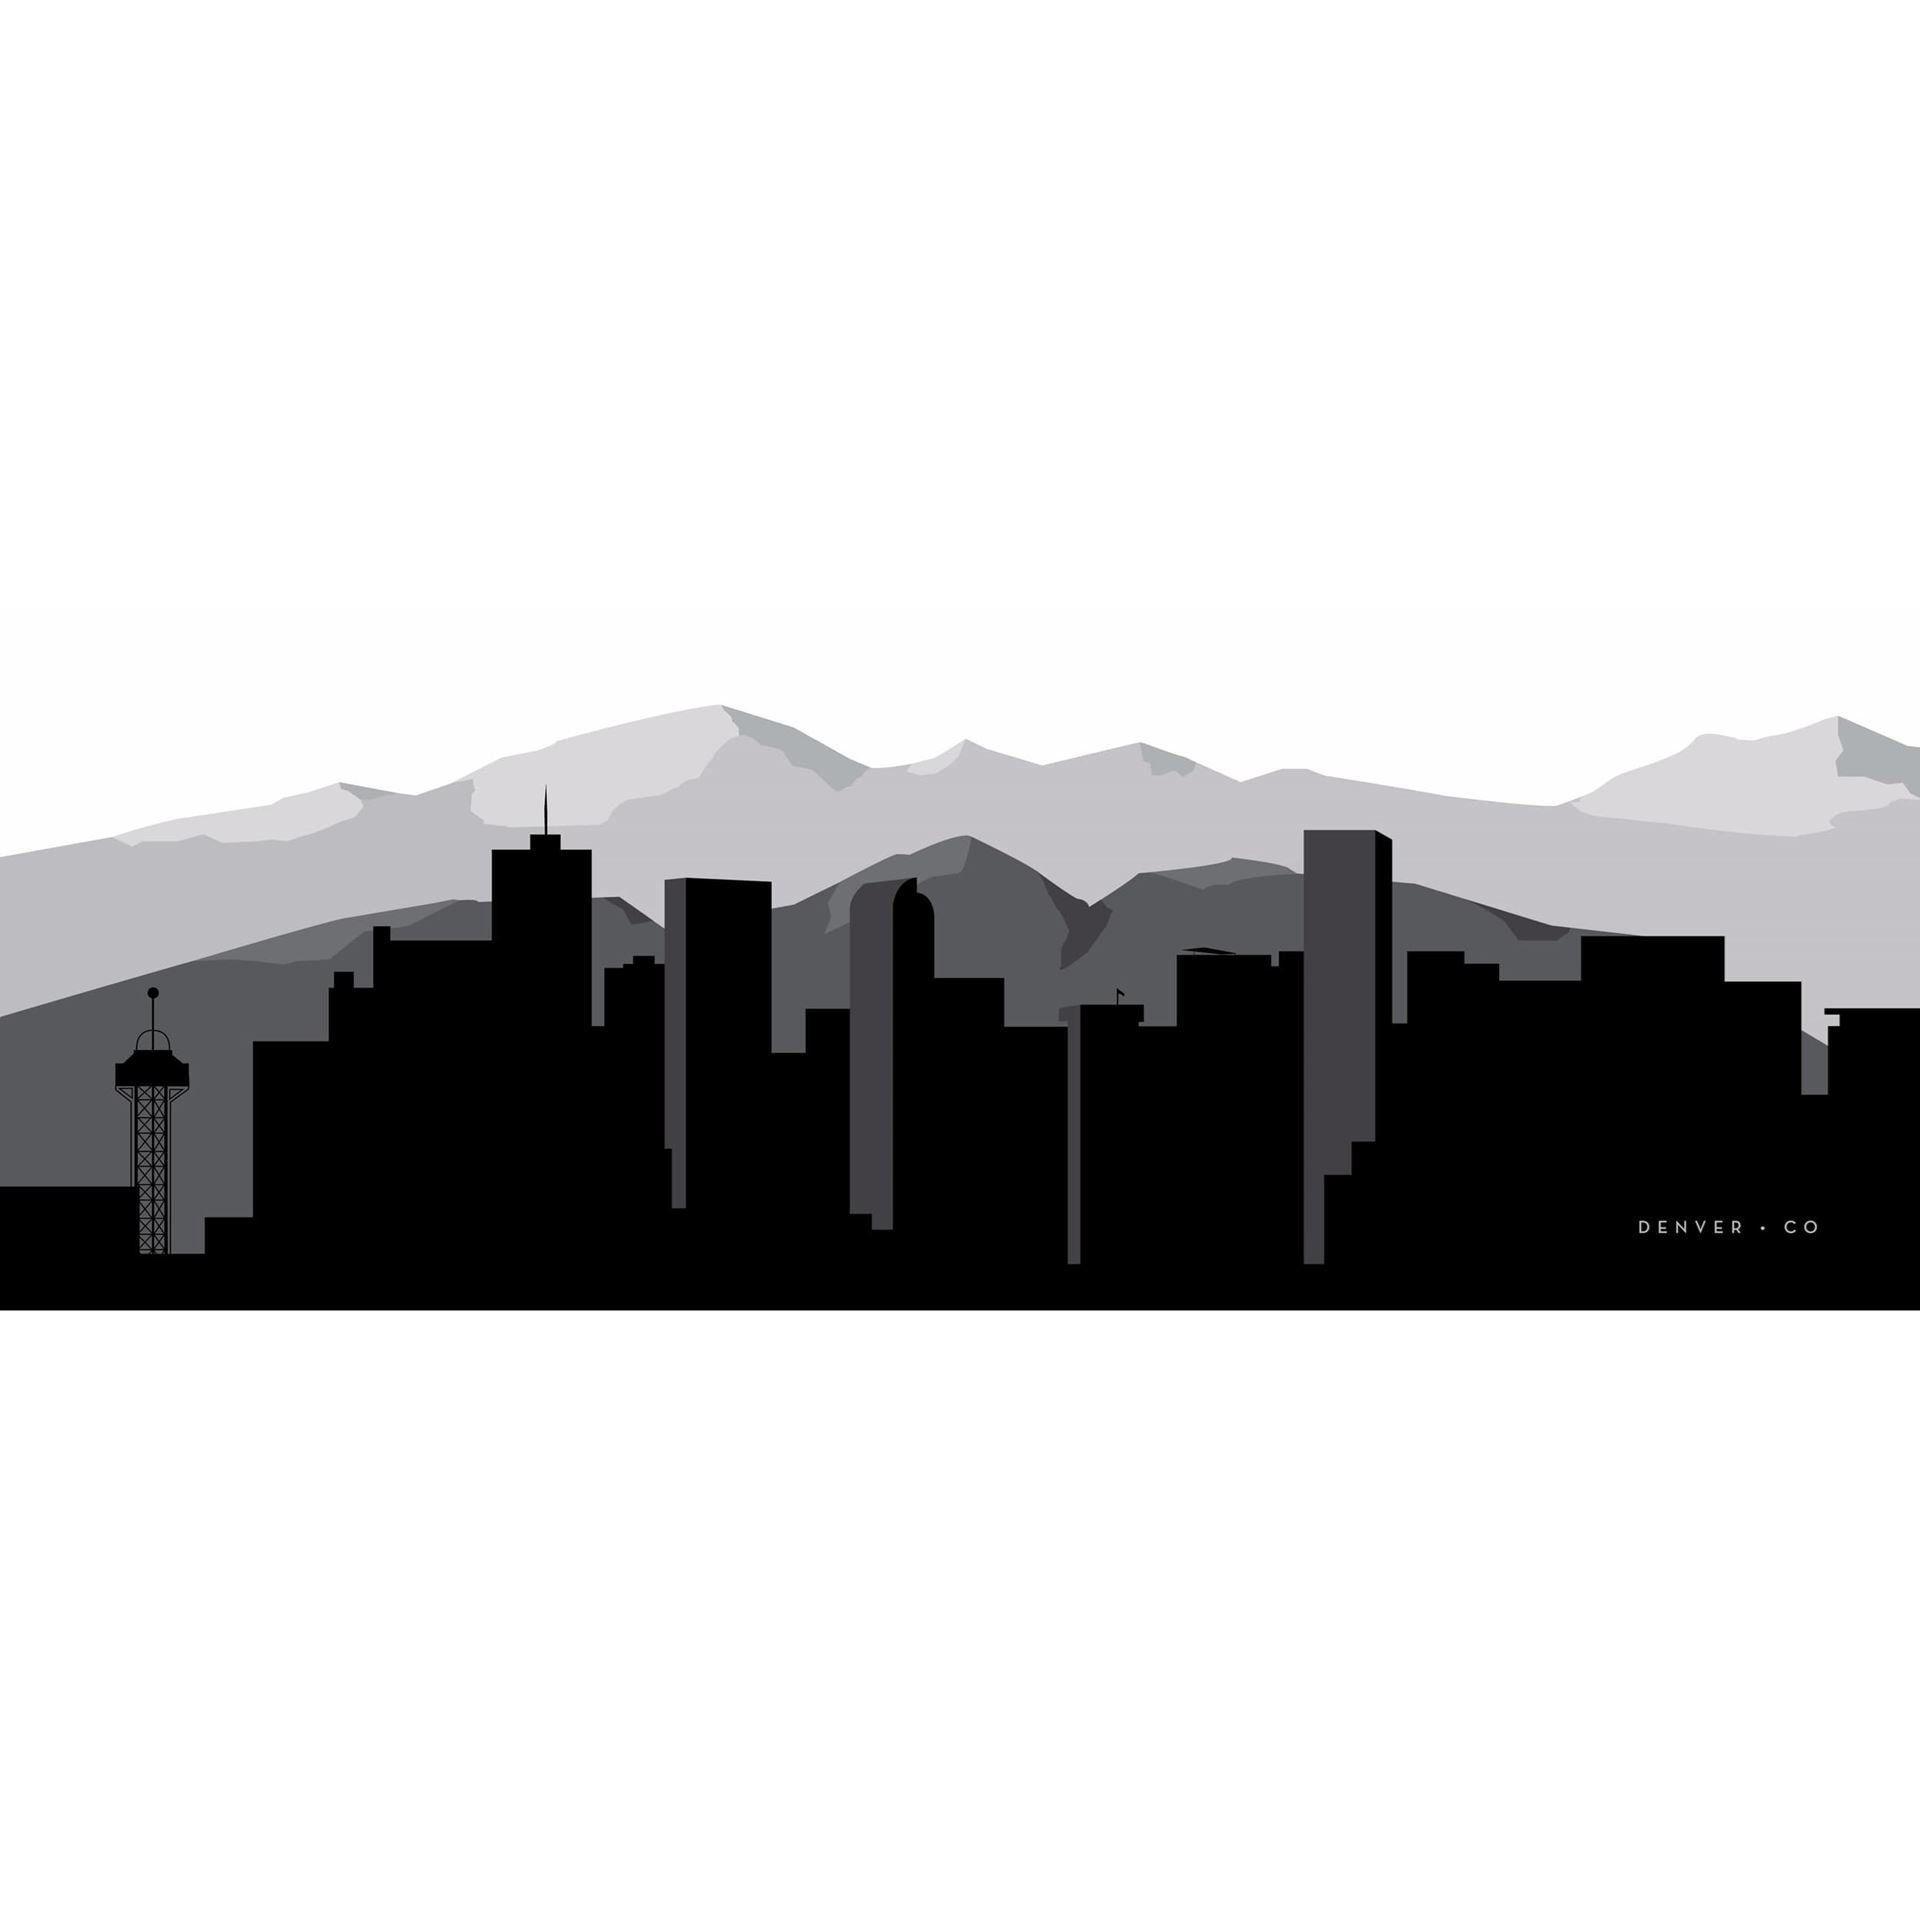 Denver graphic skyline 60x20 d in 2020 denver skyline